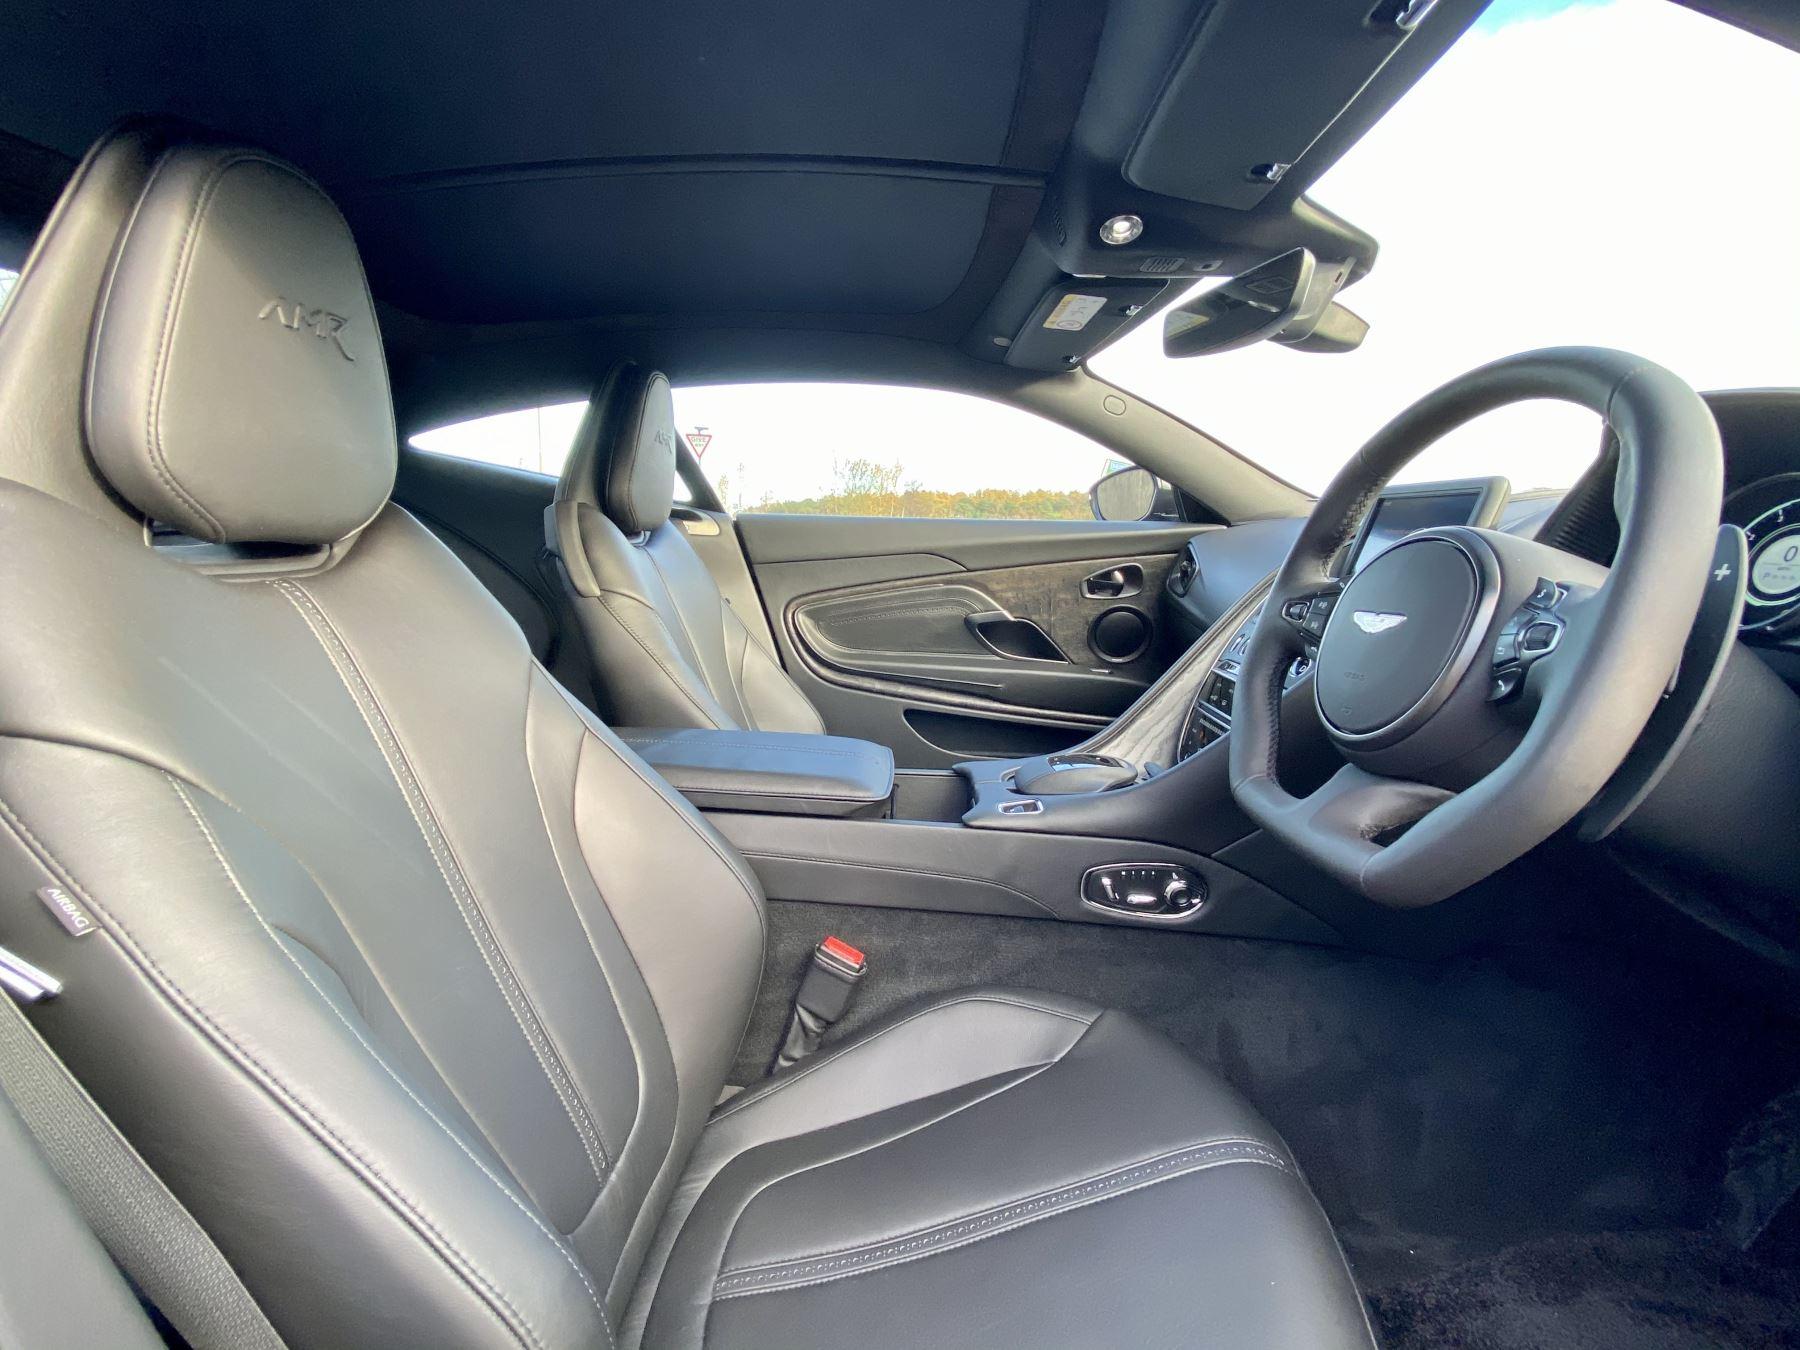 Aston Martin DB11 V12 AMR Touchtronic image 13